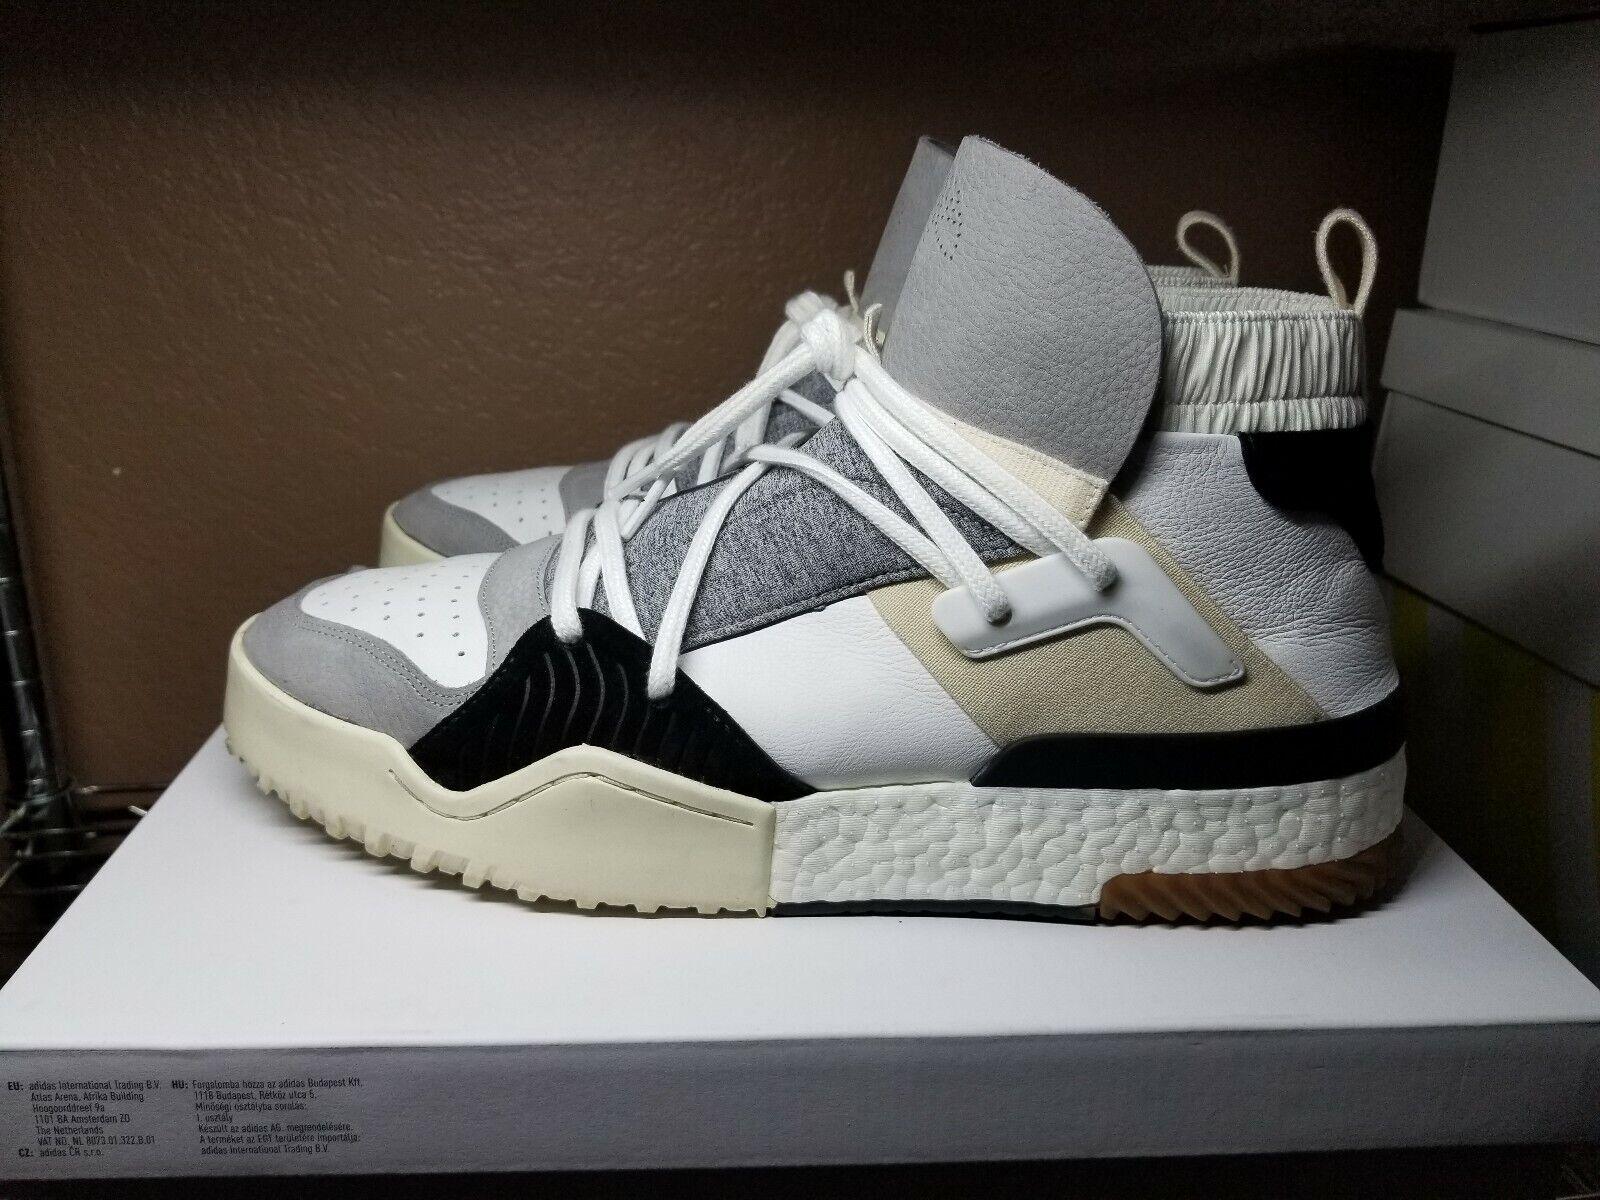 Adidas Alexander Wang BBALL HI Cream Size 13